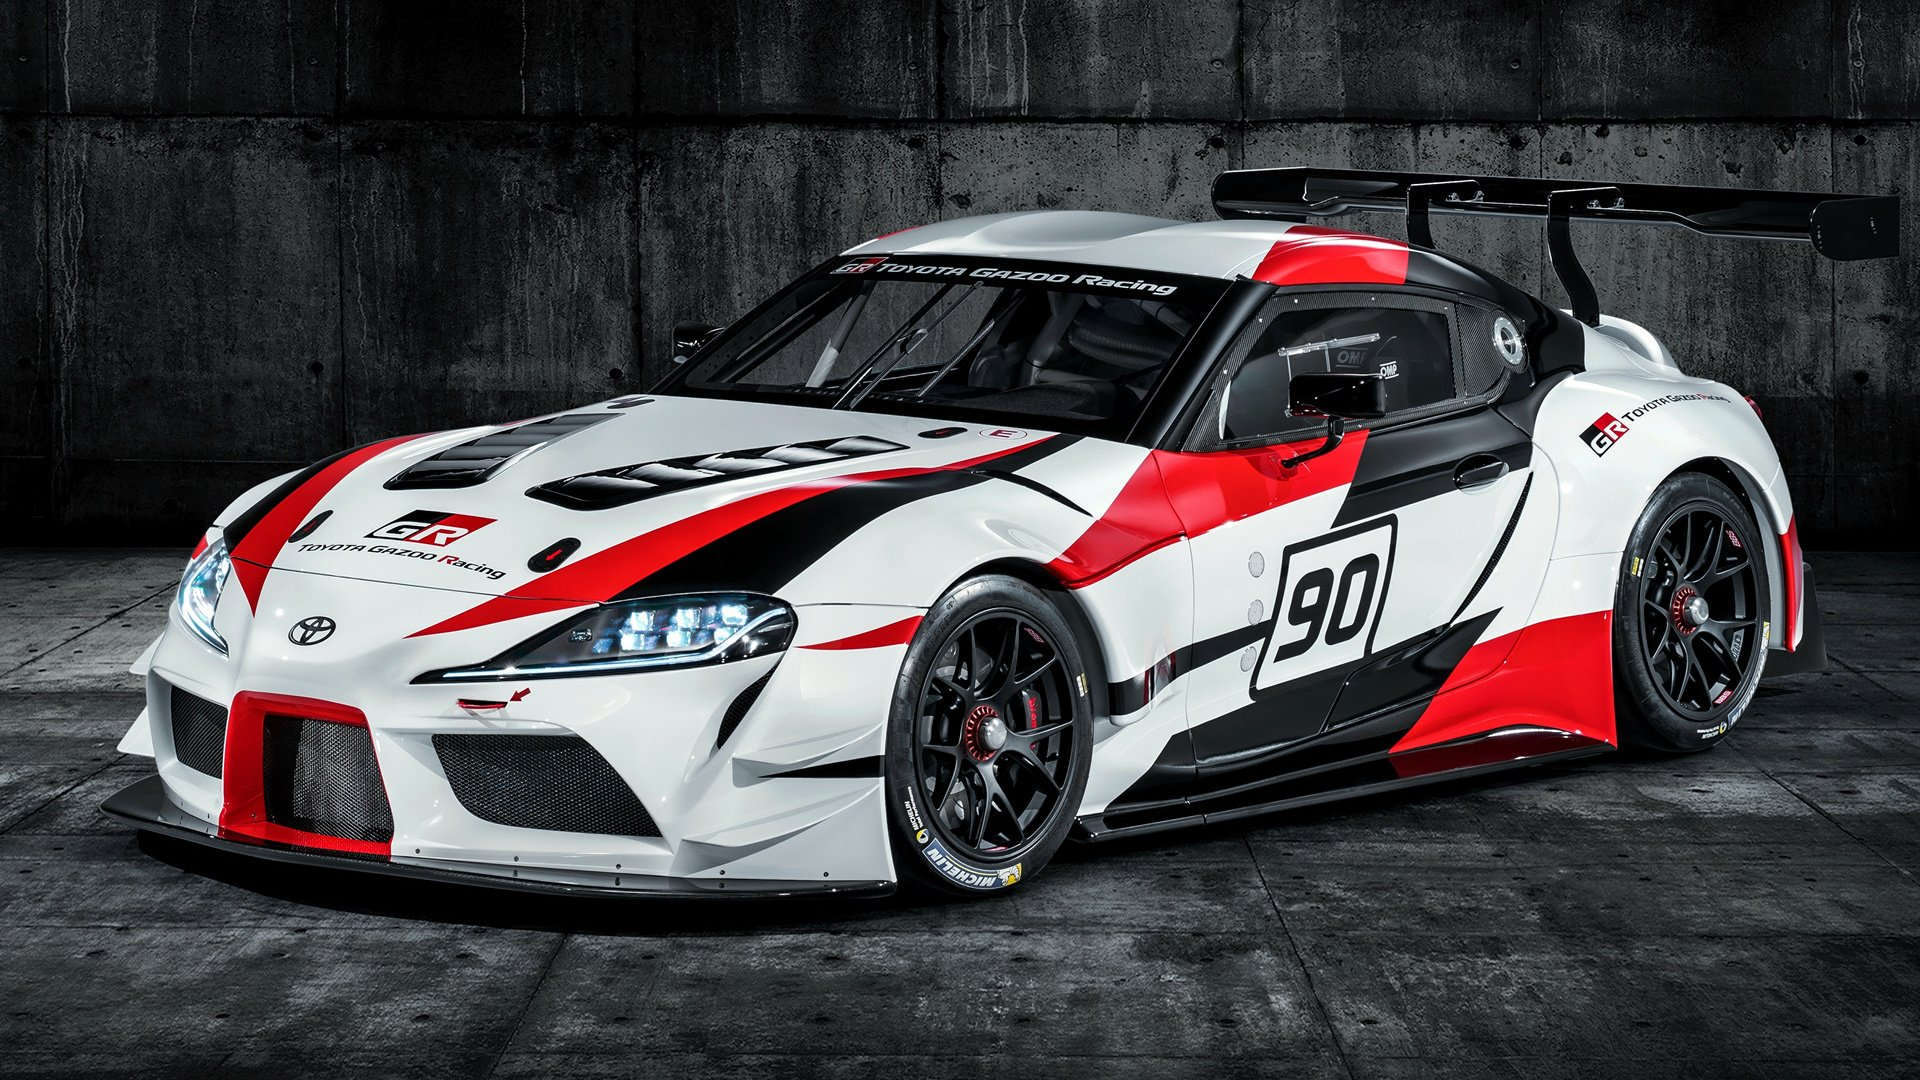 Vehicles Toyota Gr Supra Sport Car Race Car White Car Car Wallpaper